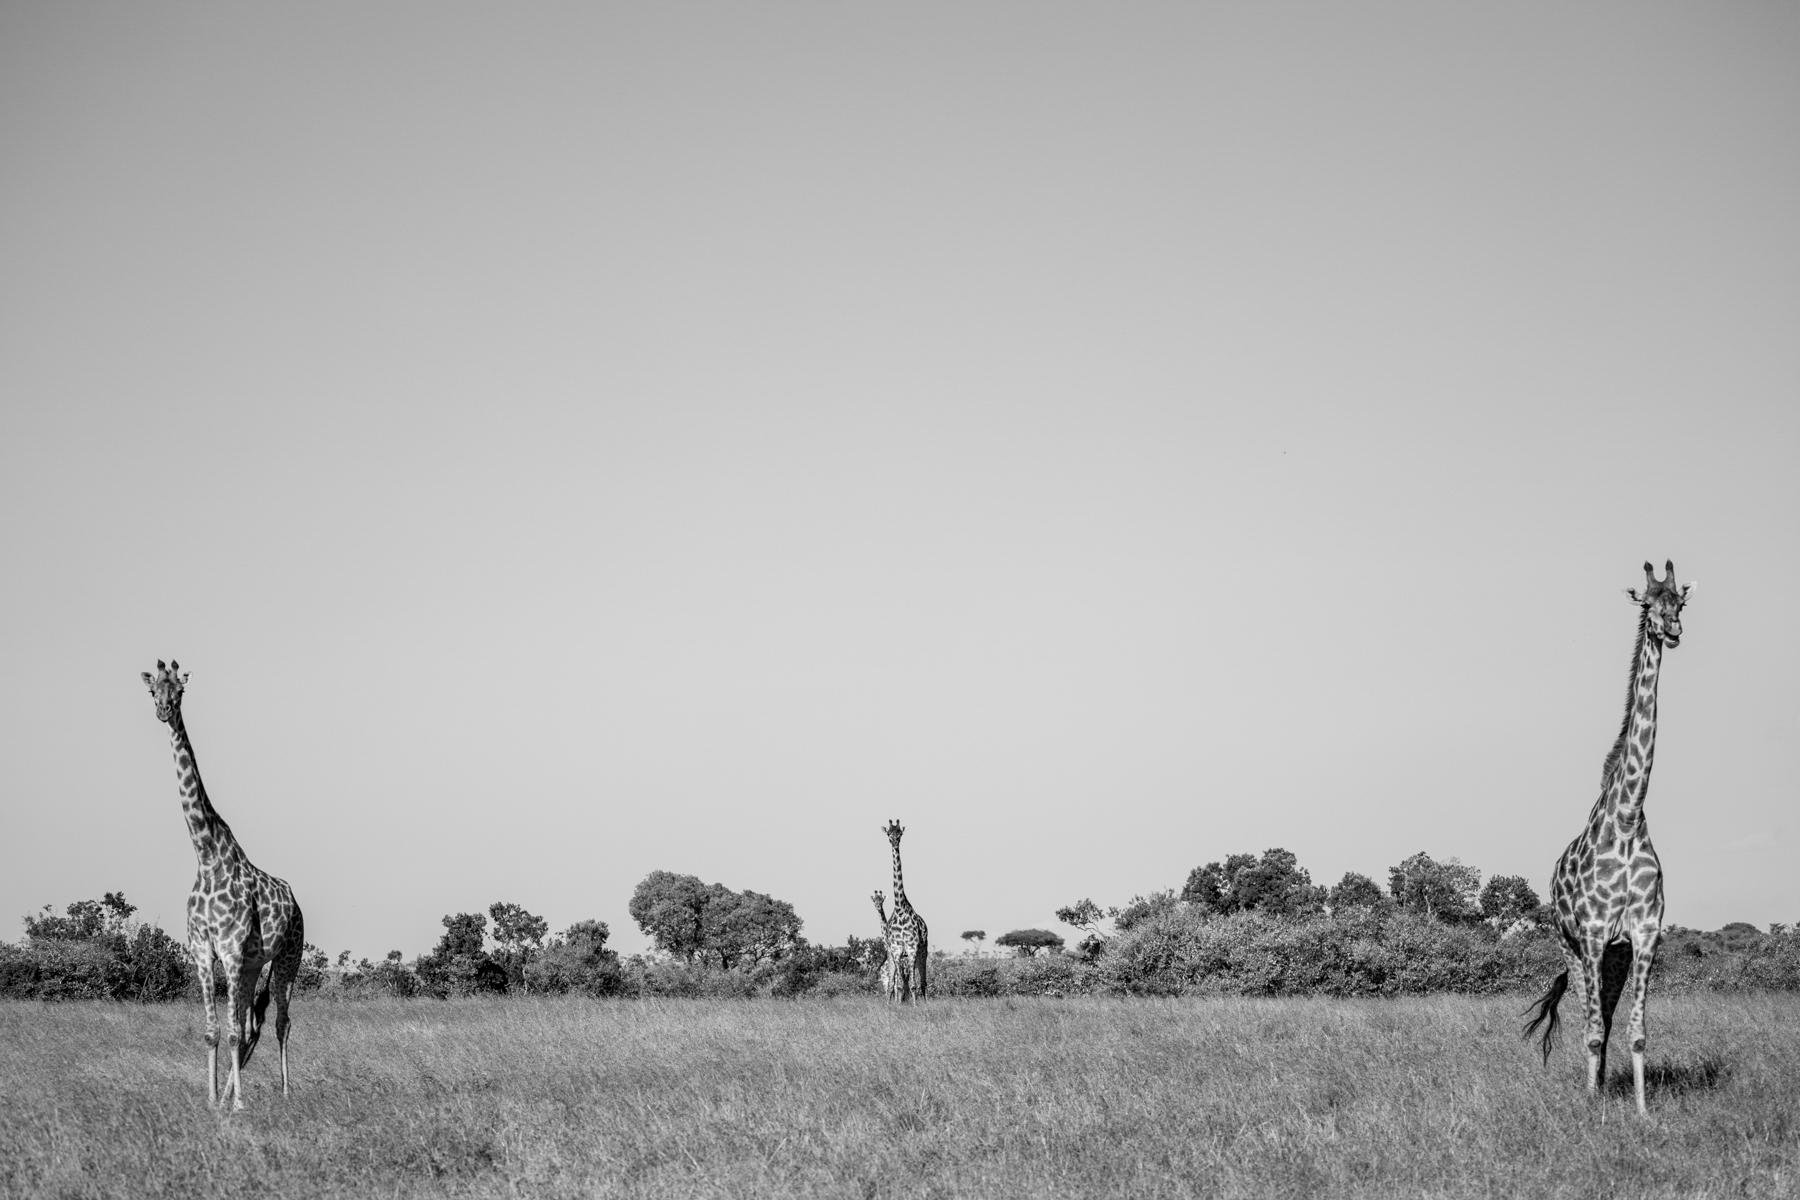 KenyaFeb2019_Safari-109.jpg